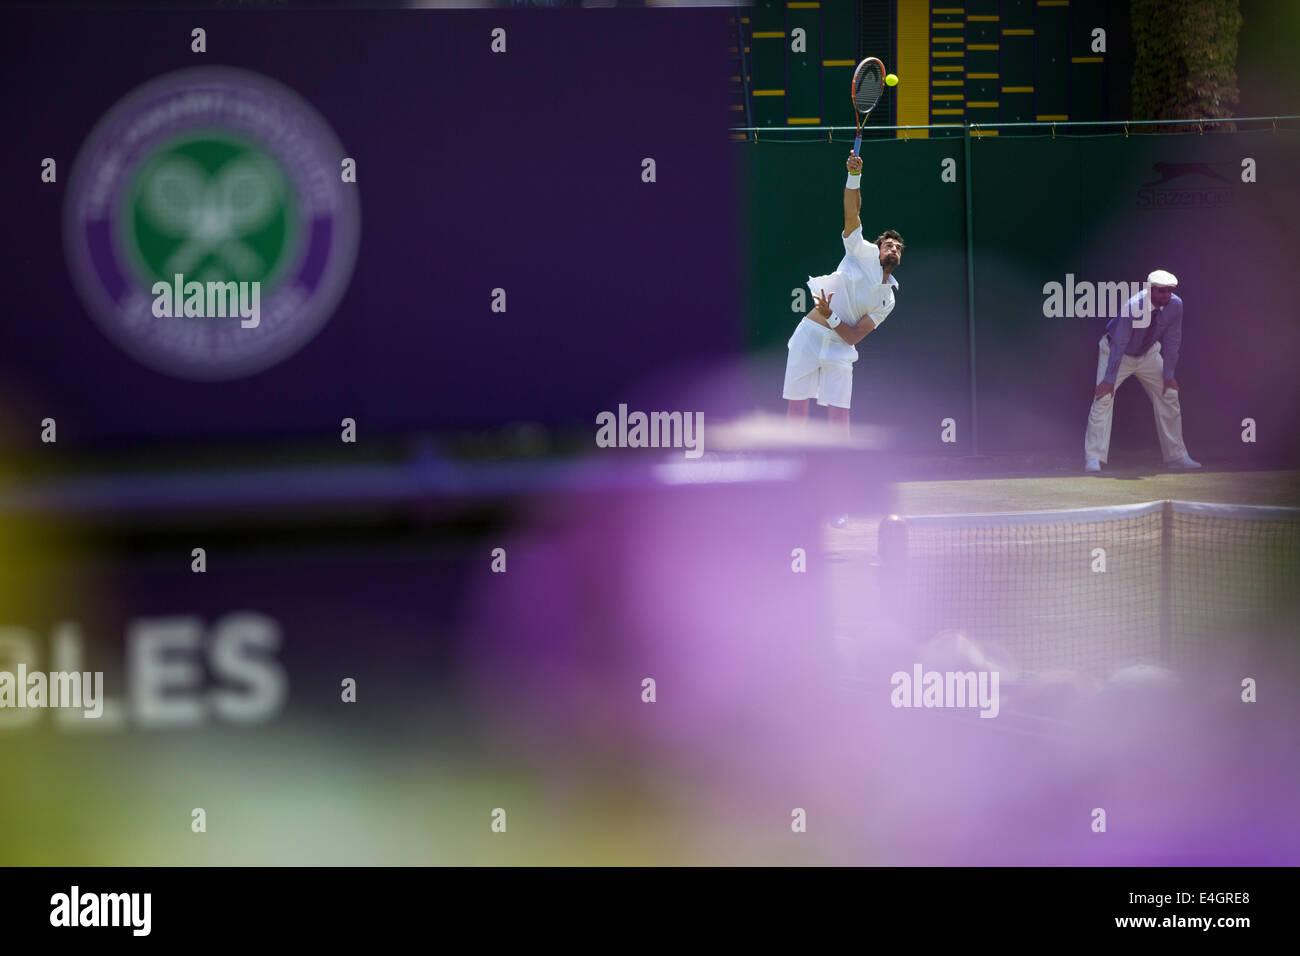 Les Championnats de tennis de Wimbledon Wimbledon 2014 Le All England Lawn Tennis Club Wimbledon & Crocquet Photo Stock